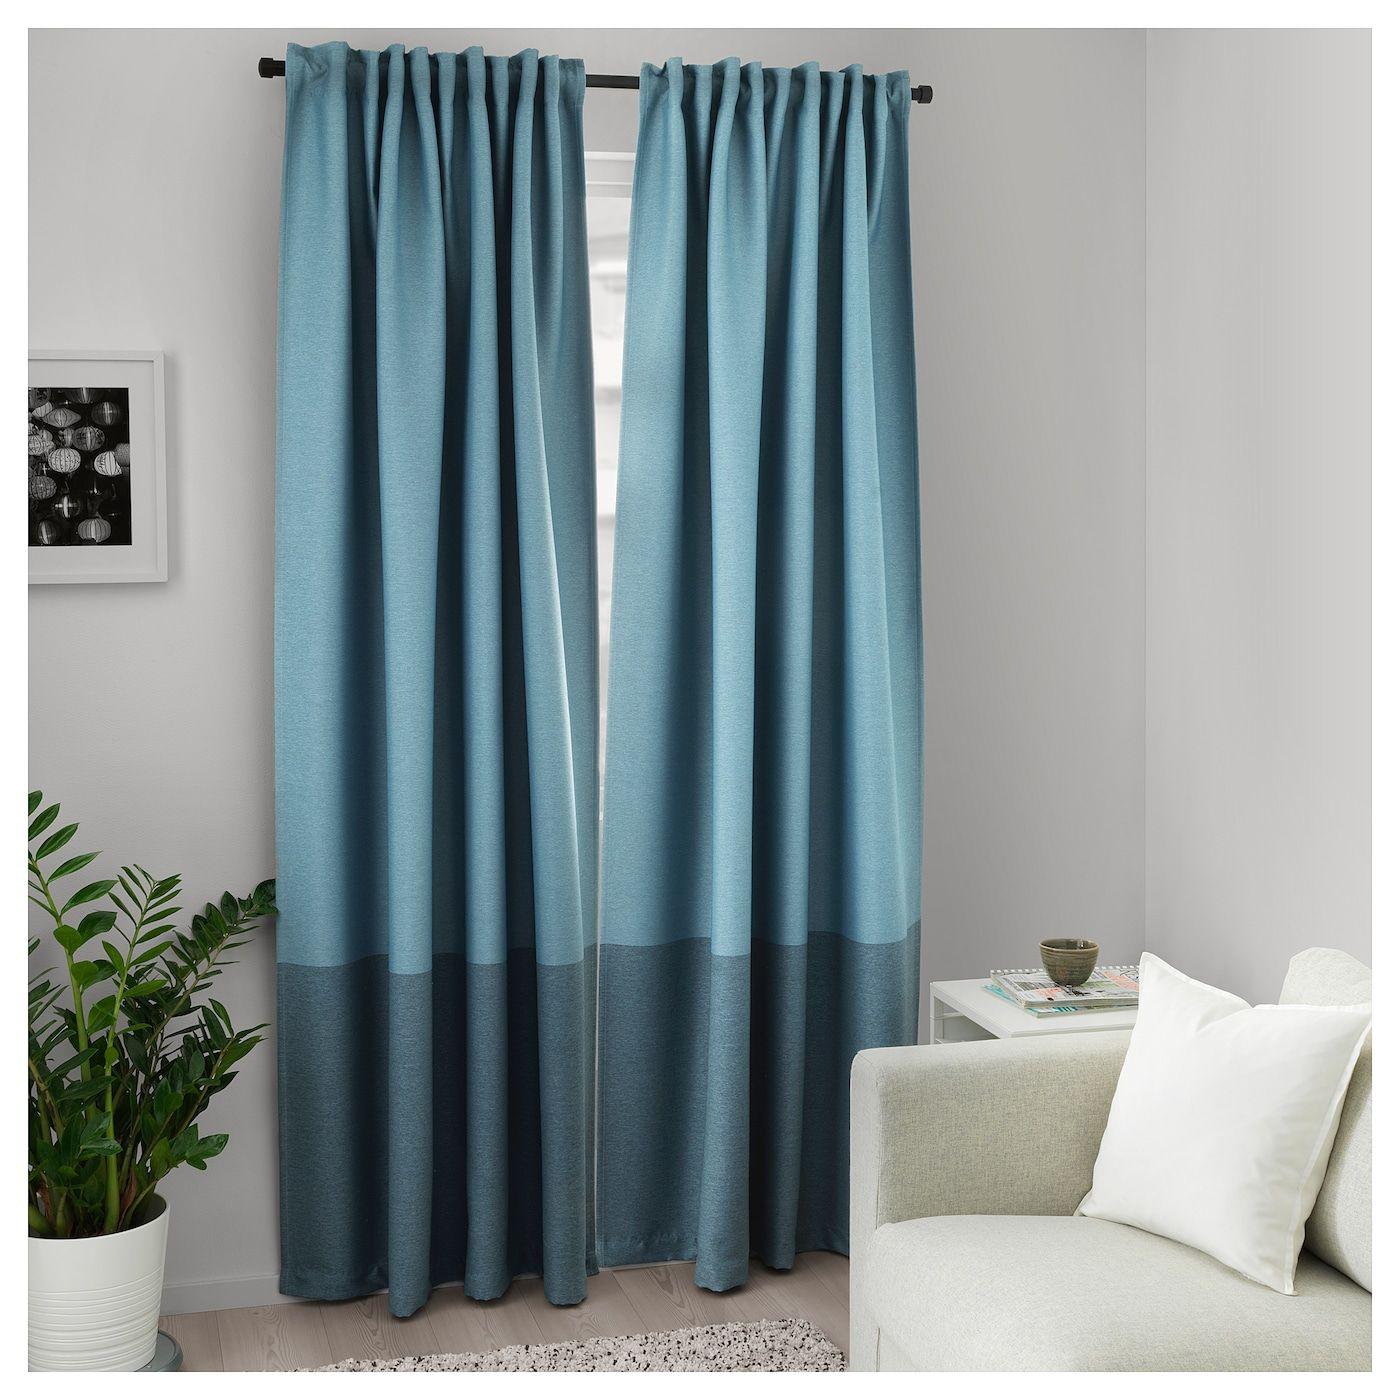 Marjun Room Darkening Curtains 1 Pair Blue 57x98 Rideaux